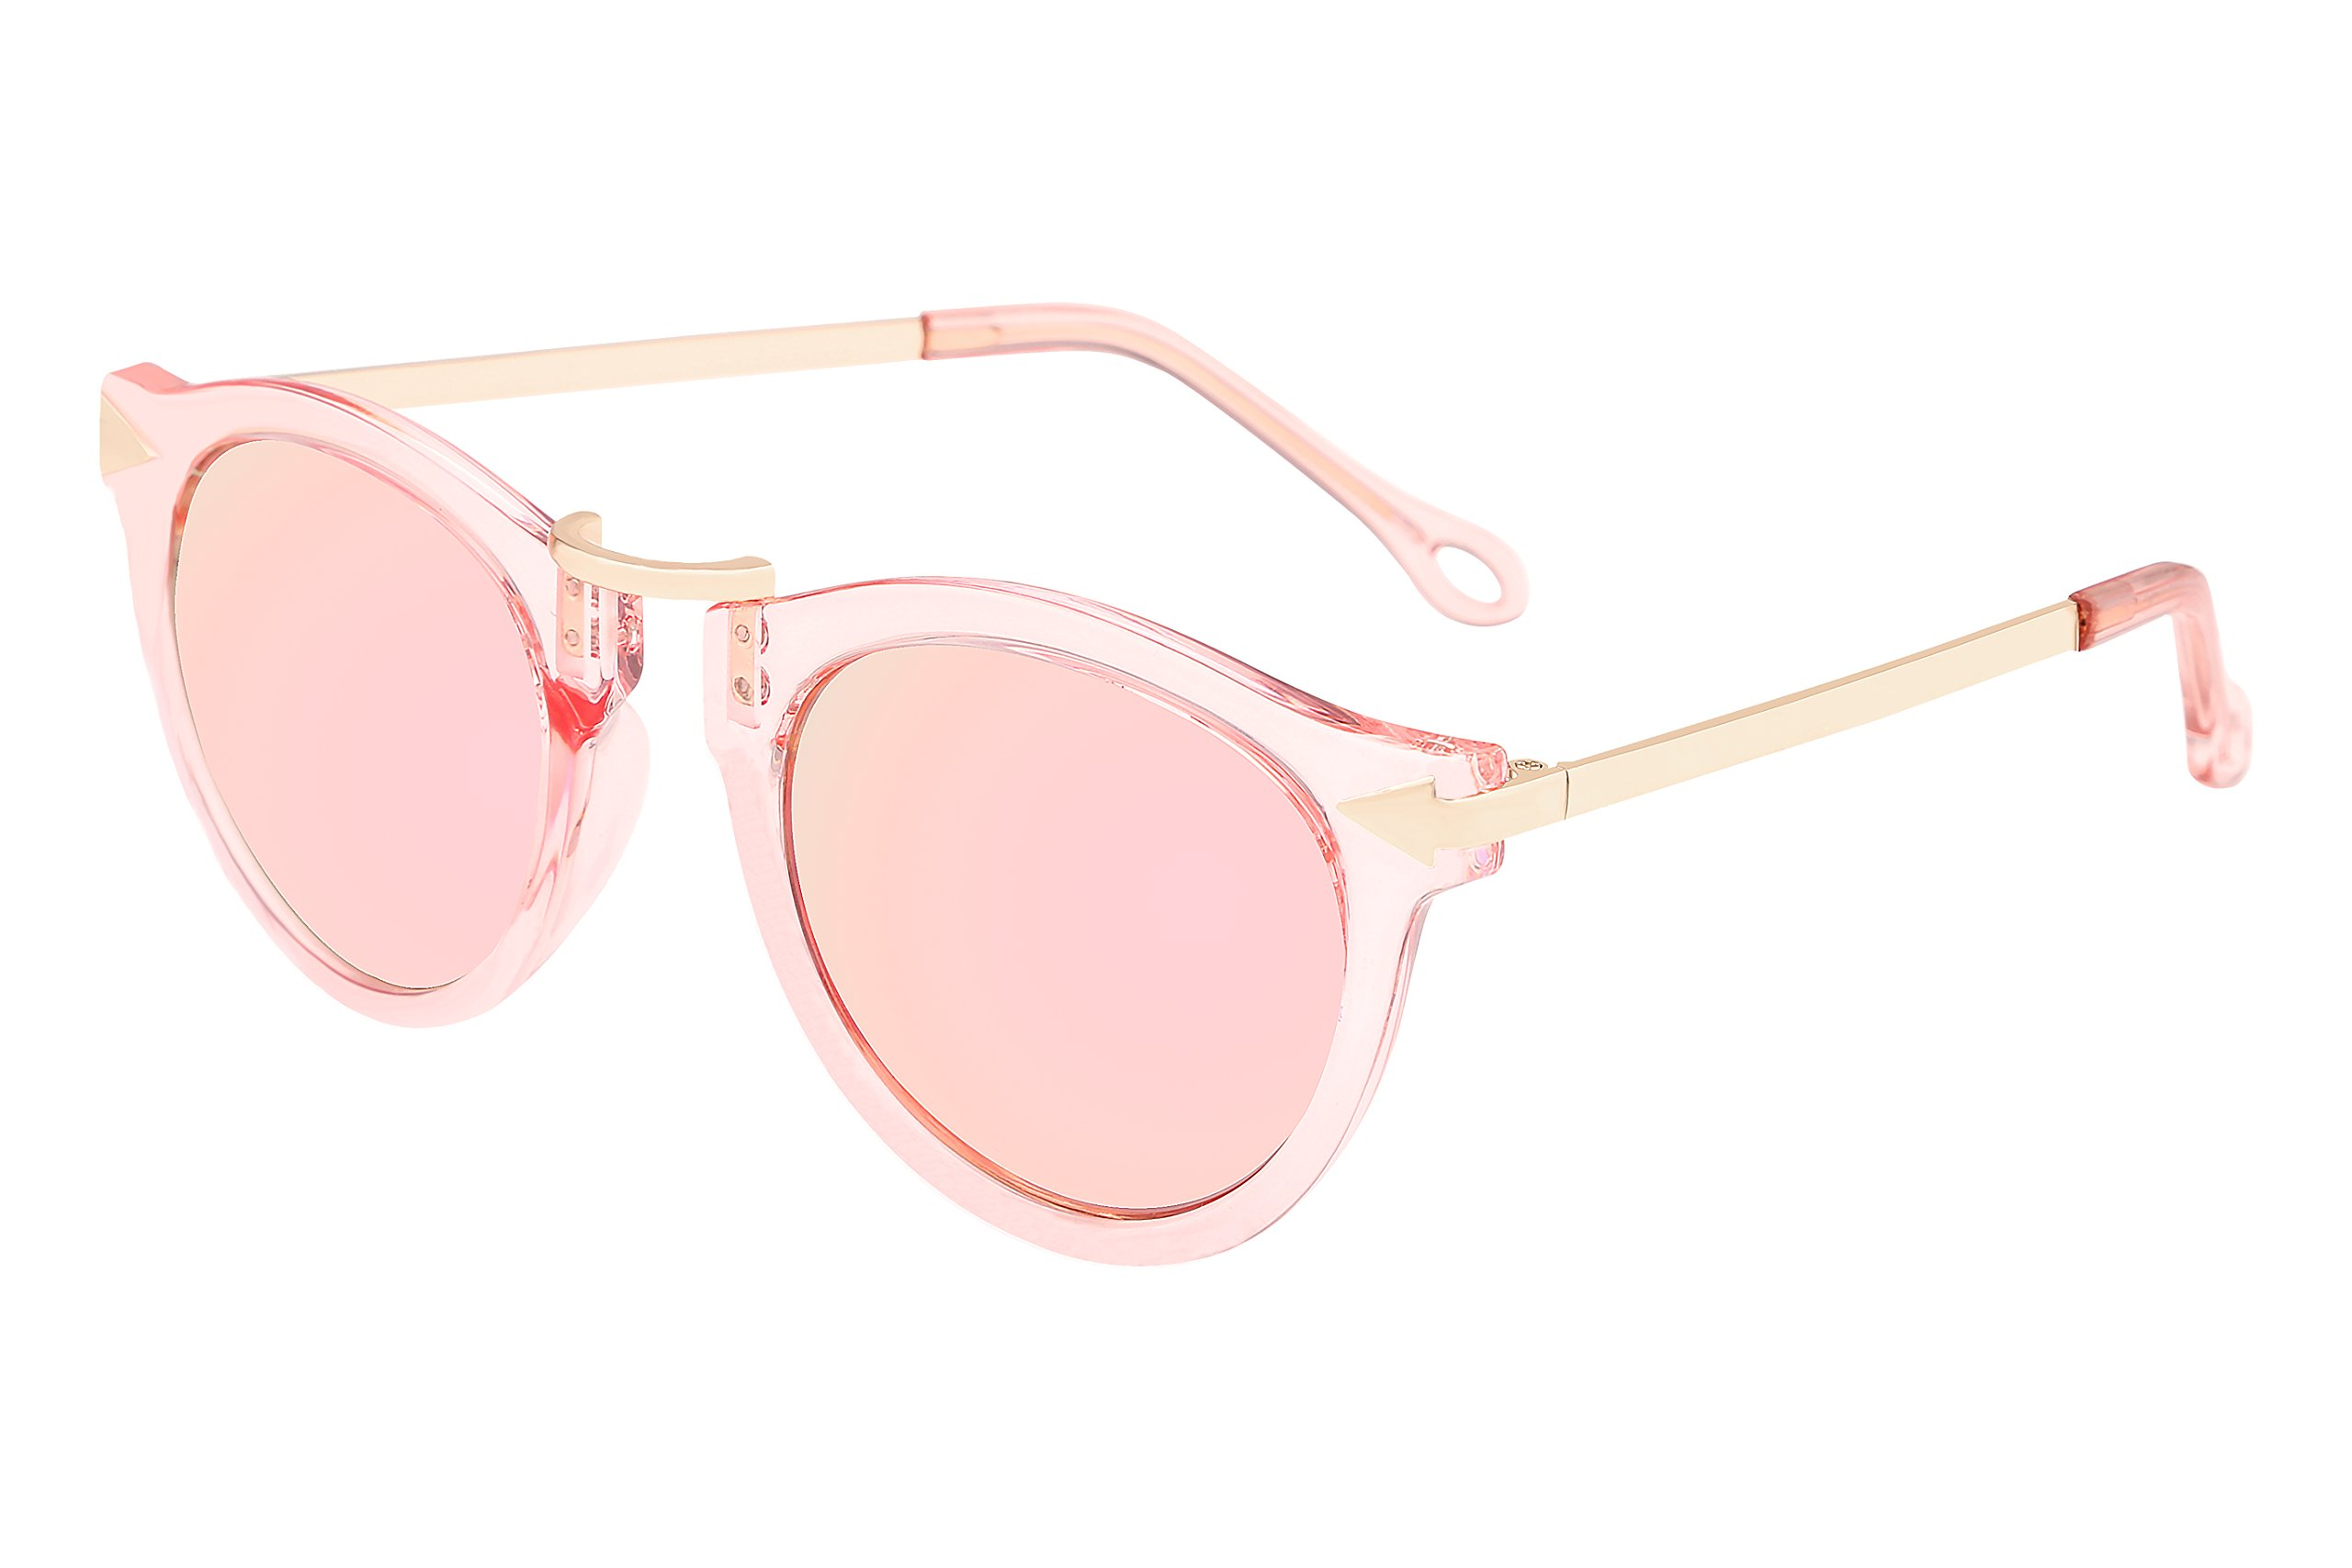 FEISEDY Vintage Arrow Women Sunglasses Pink Metal Frame Polycarbonate Lenses B1101 B2427